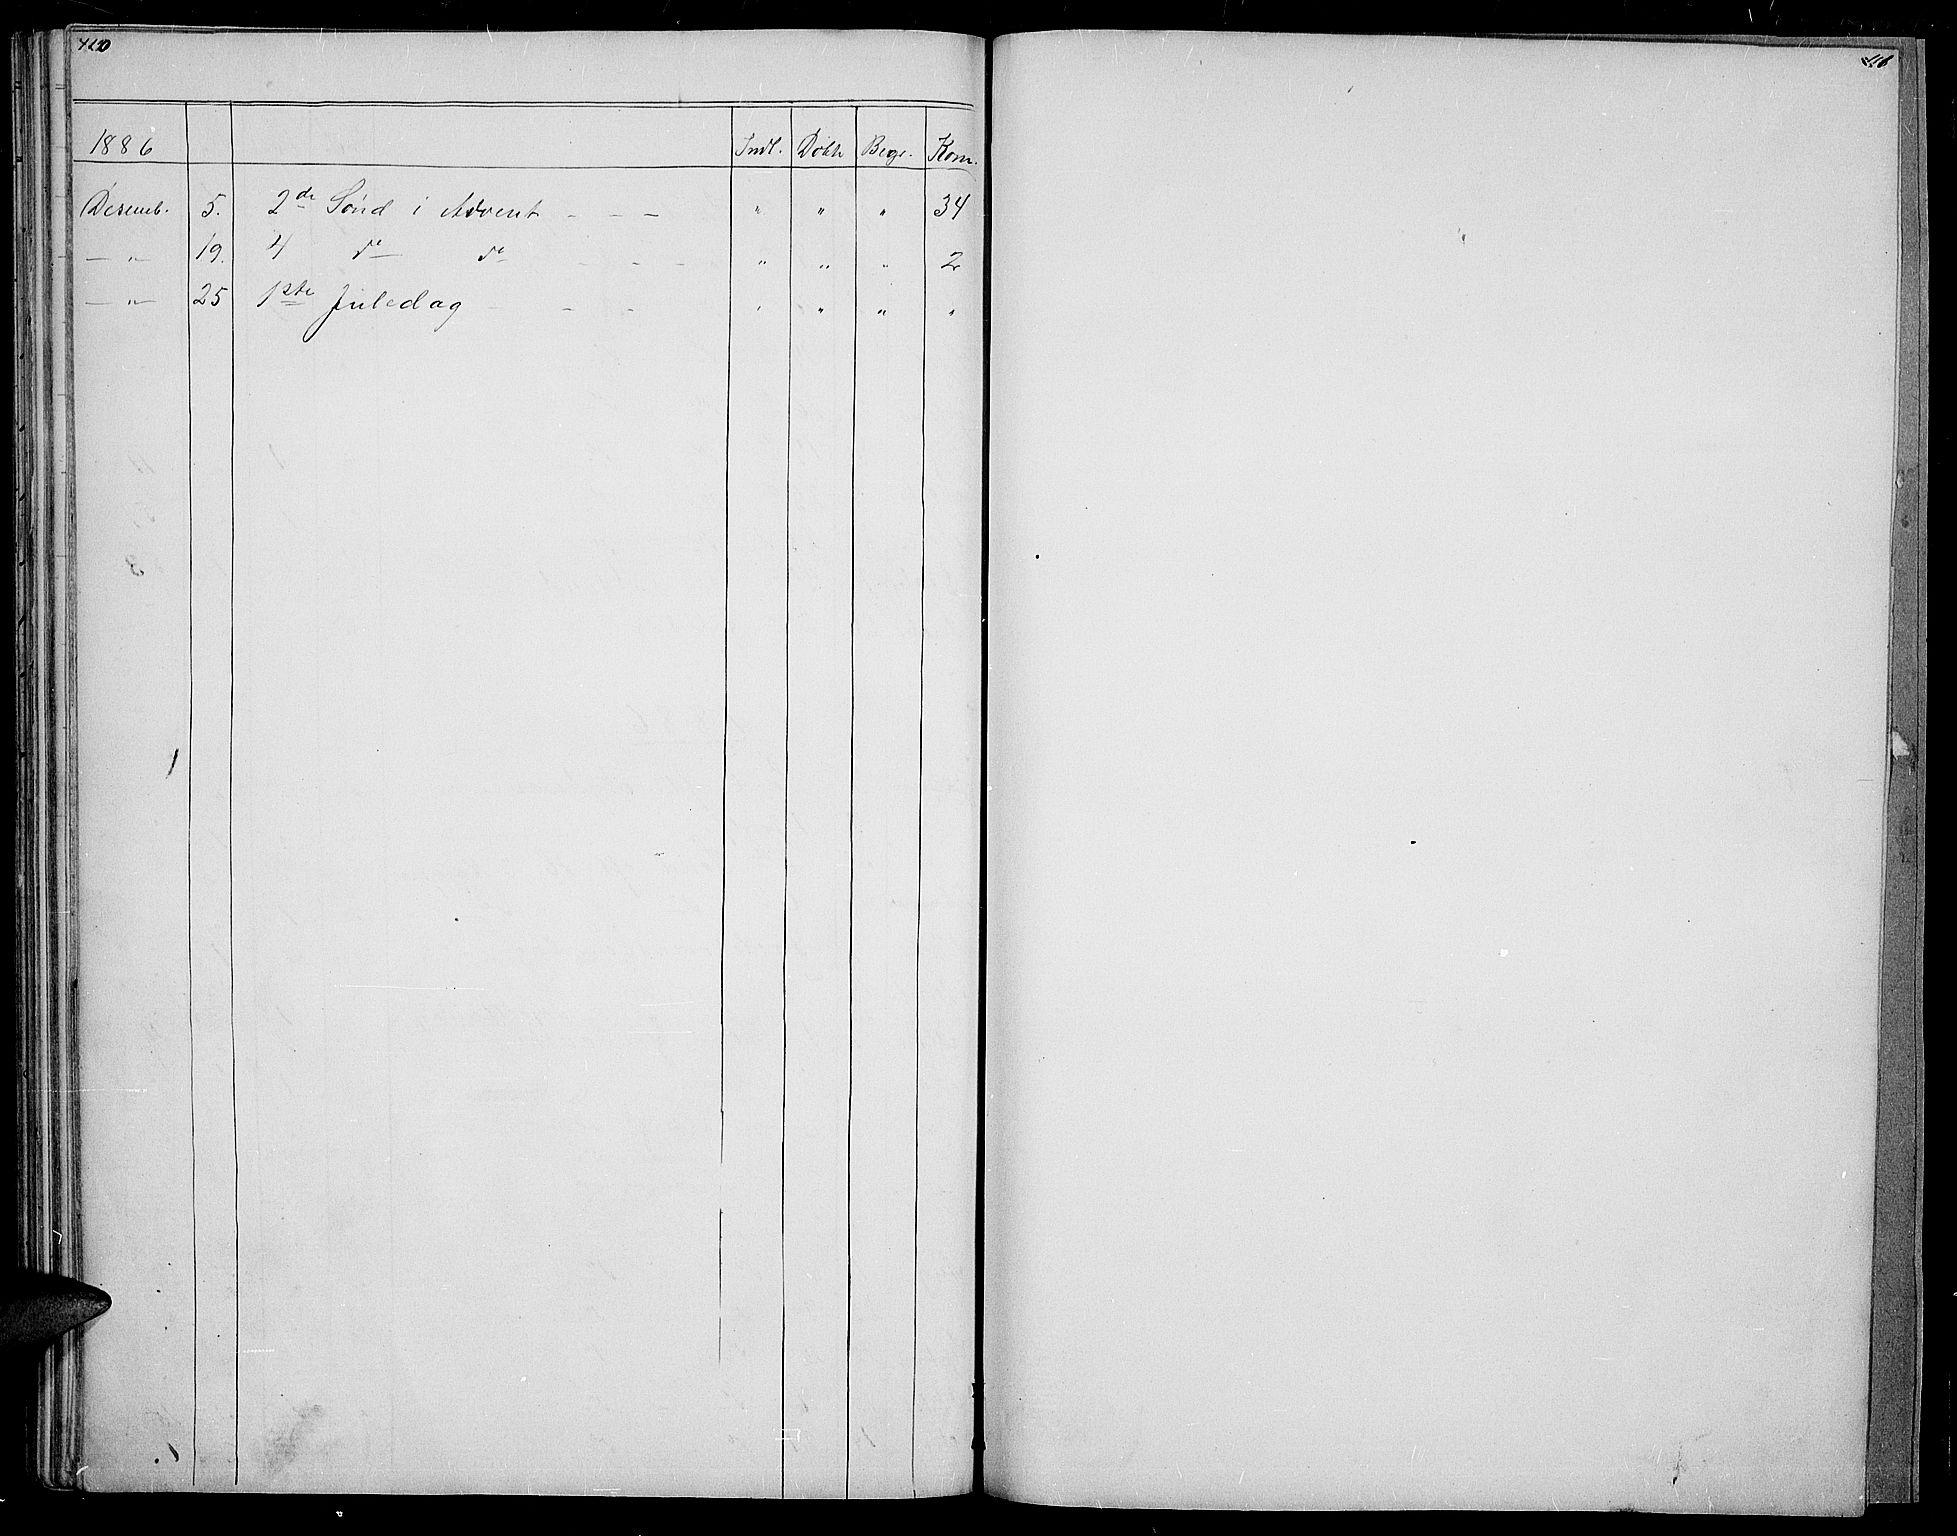 SAH, Øystre Slidre prestekontor, Klokkerbok nr. 2, 1866-1886, s. 110-111